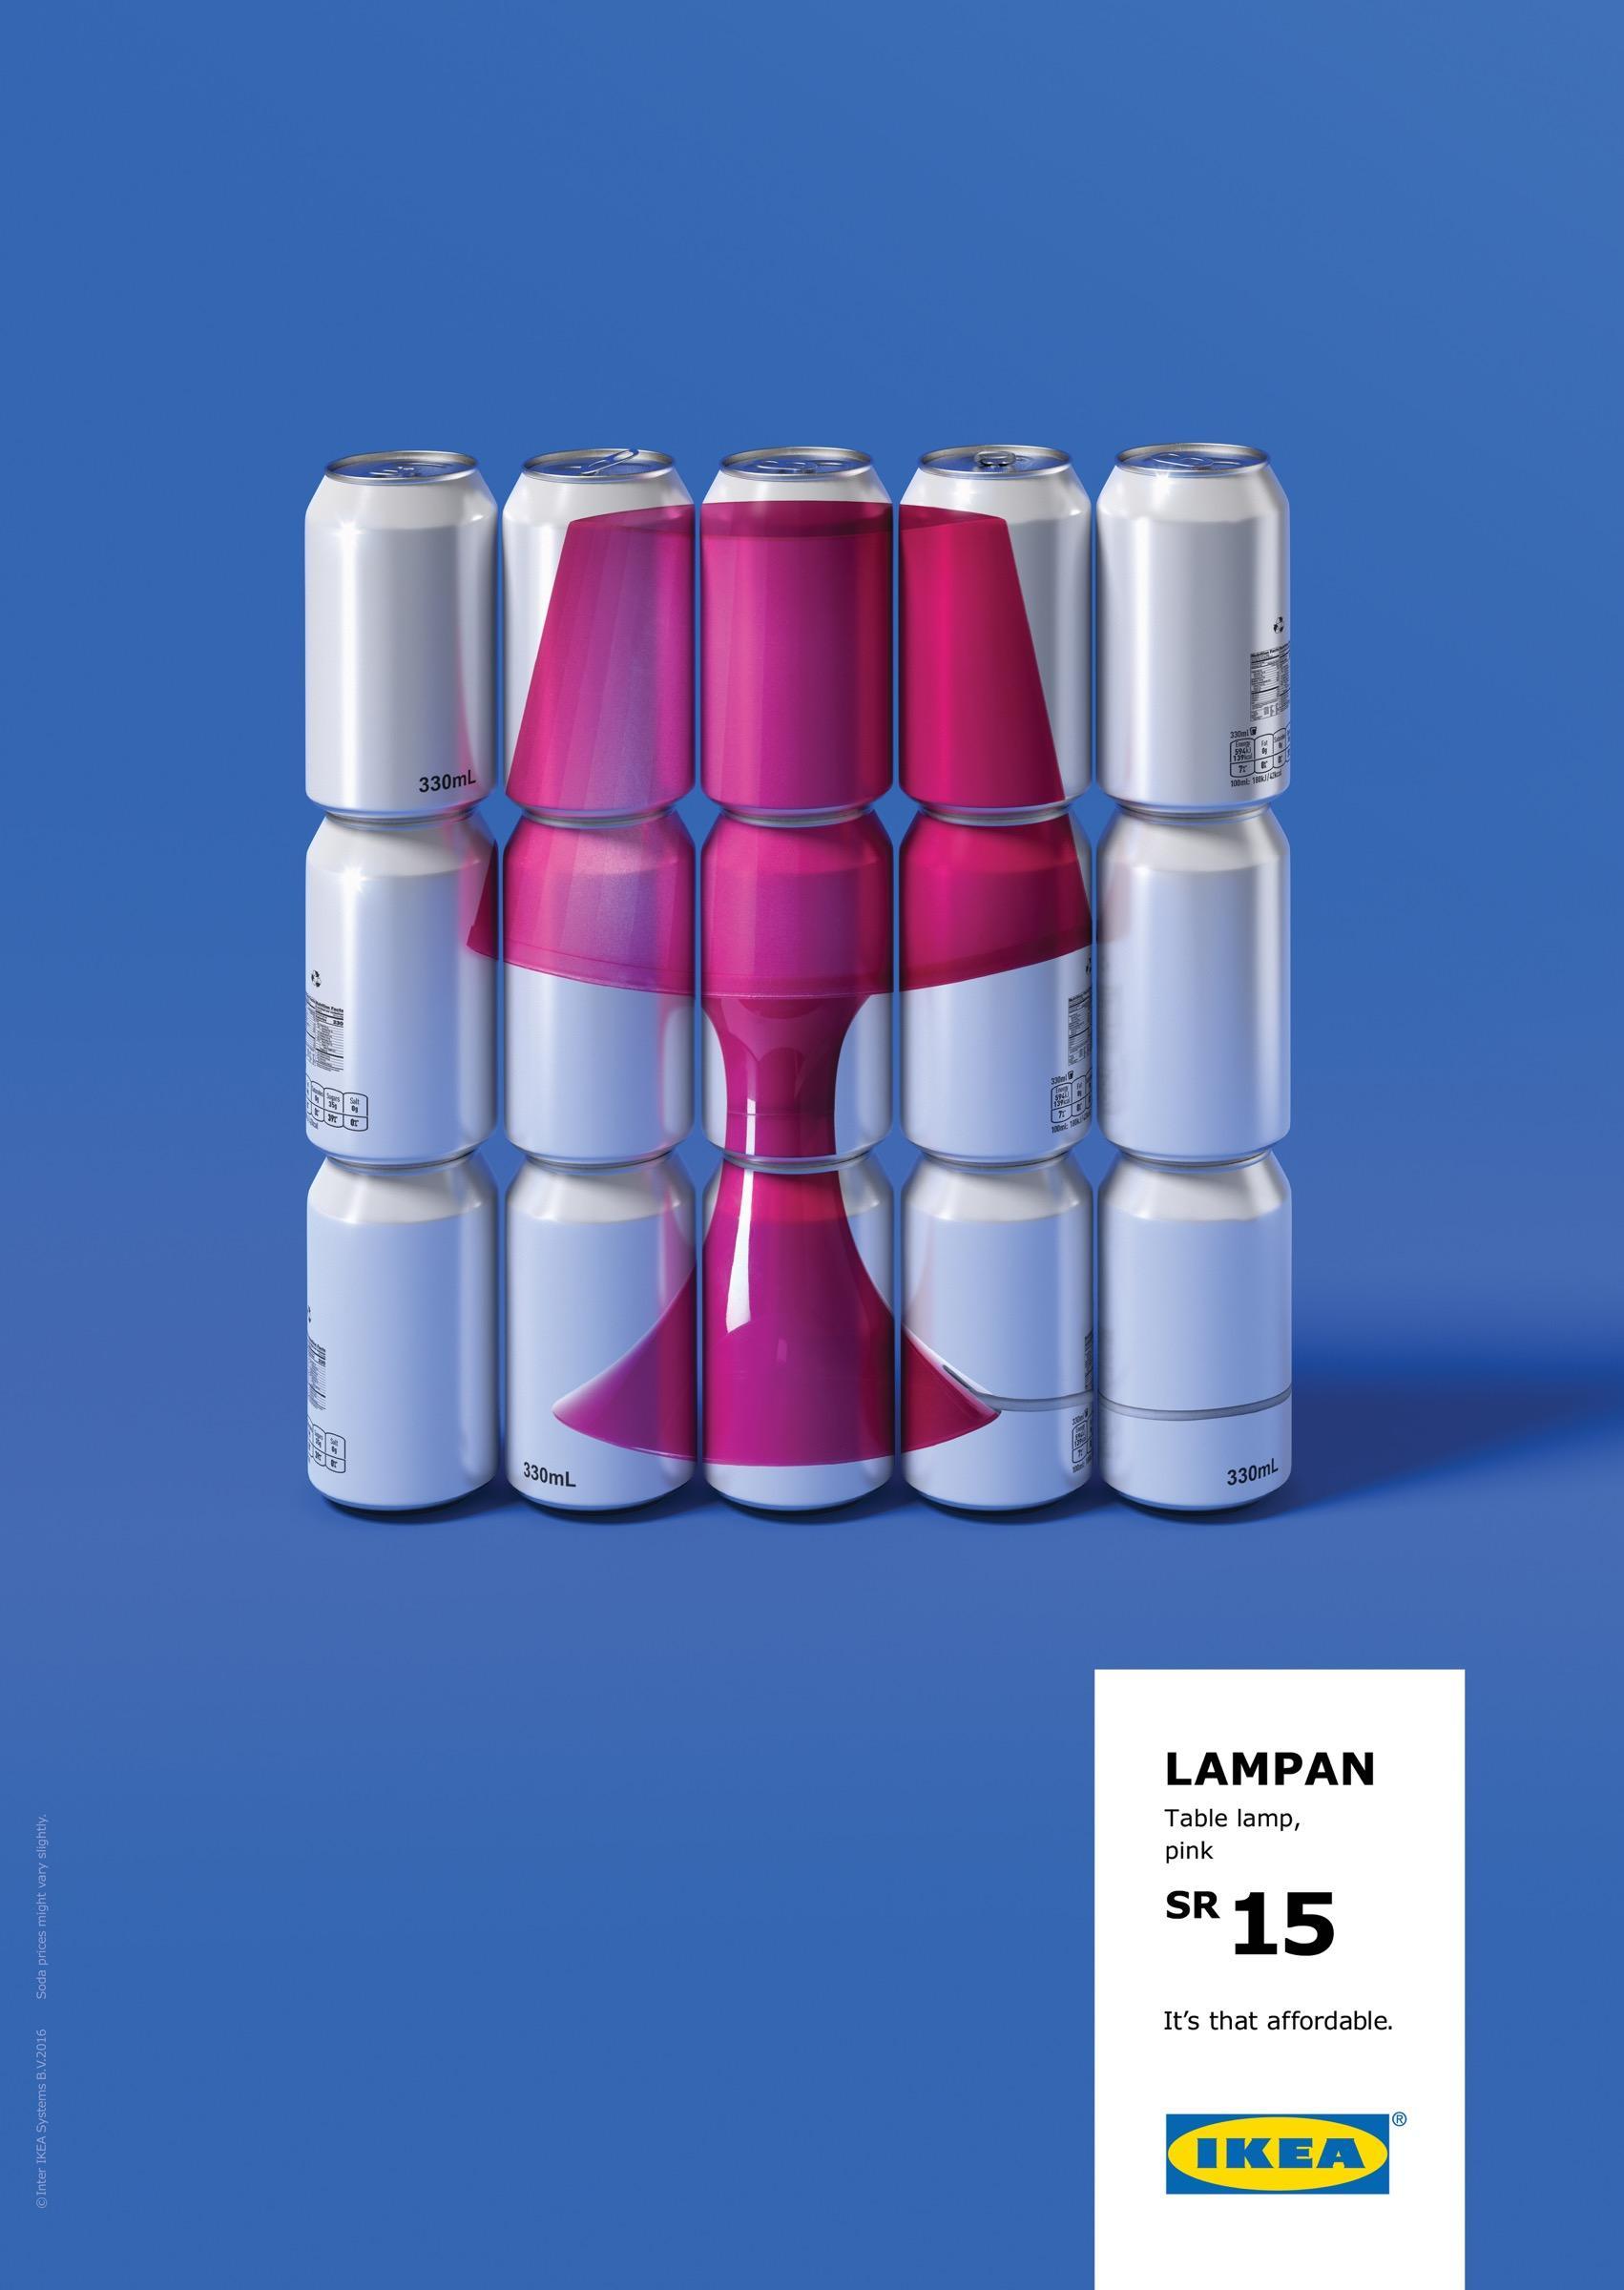 IKEA Print Ad   Lamp